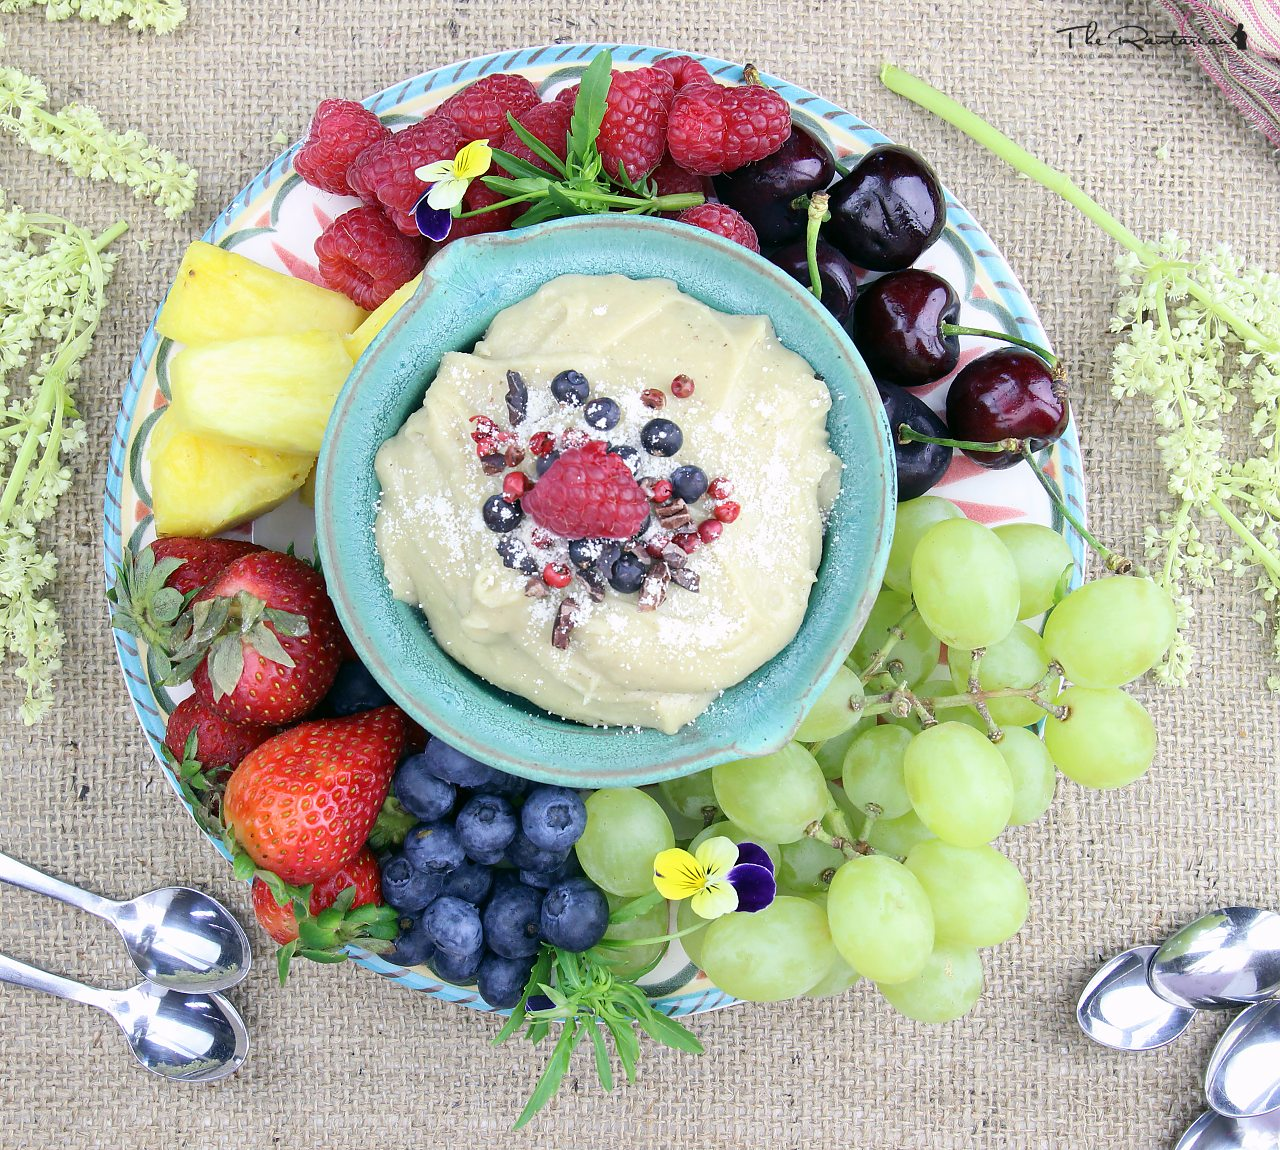 Raw Food Diet Meal Plan The Rawtarian